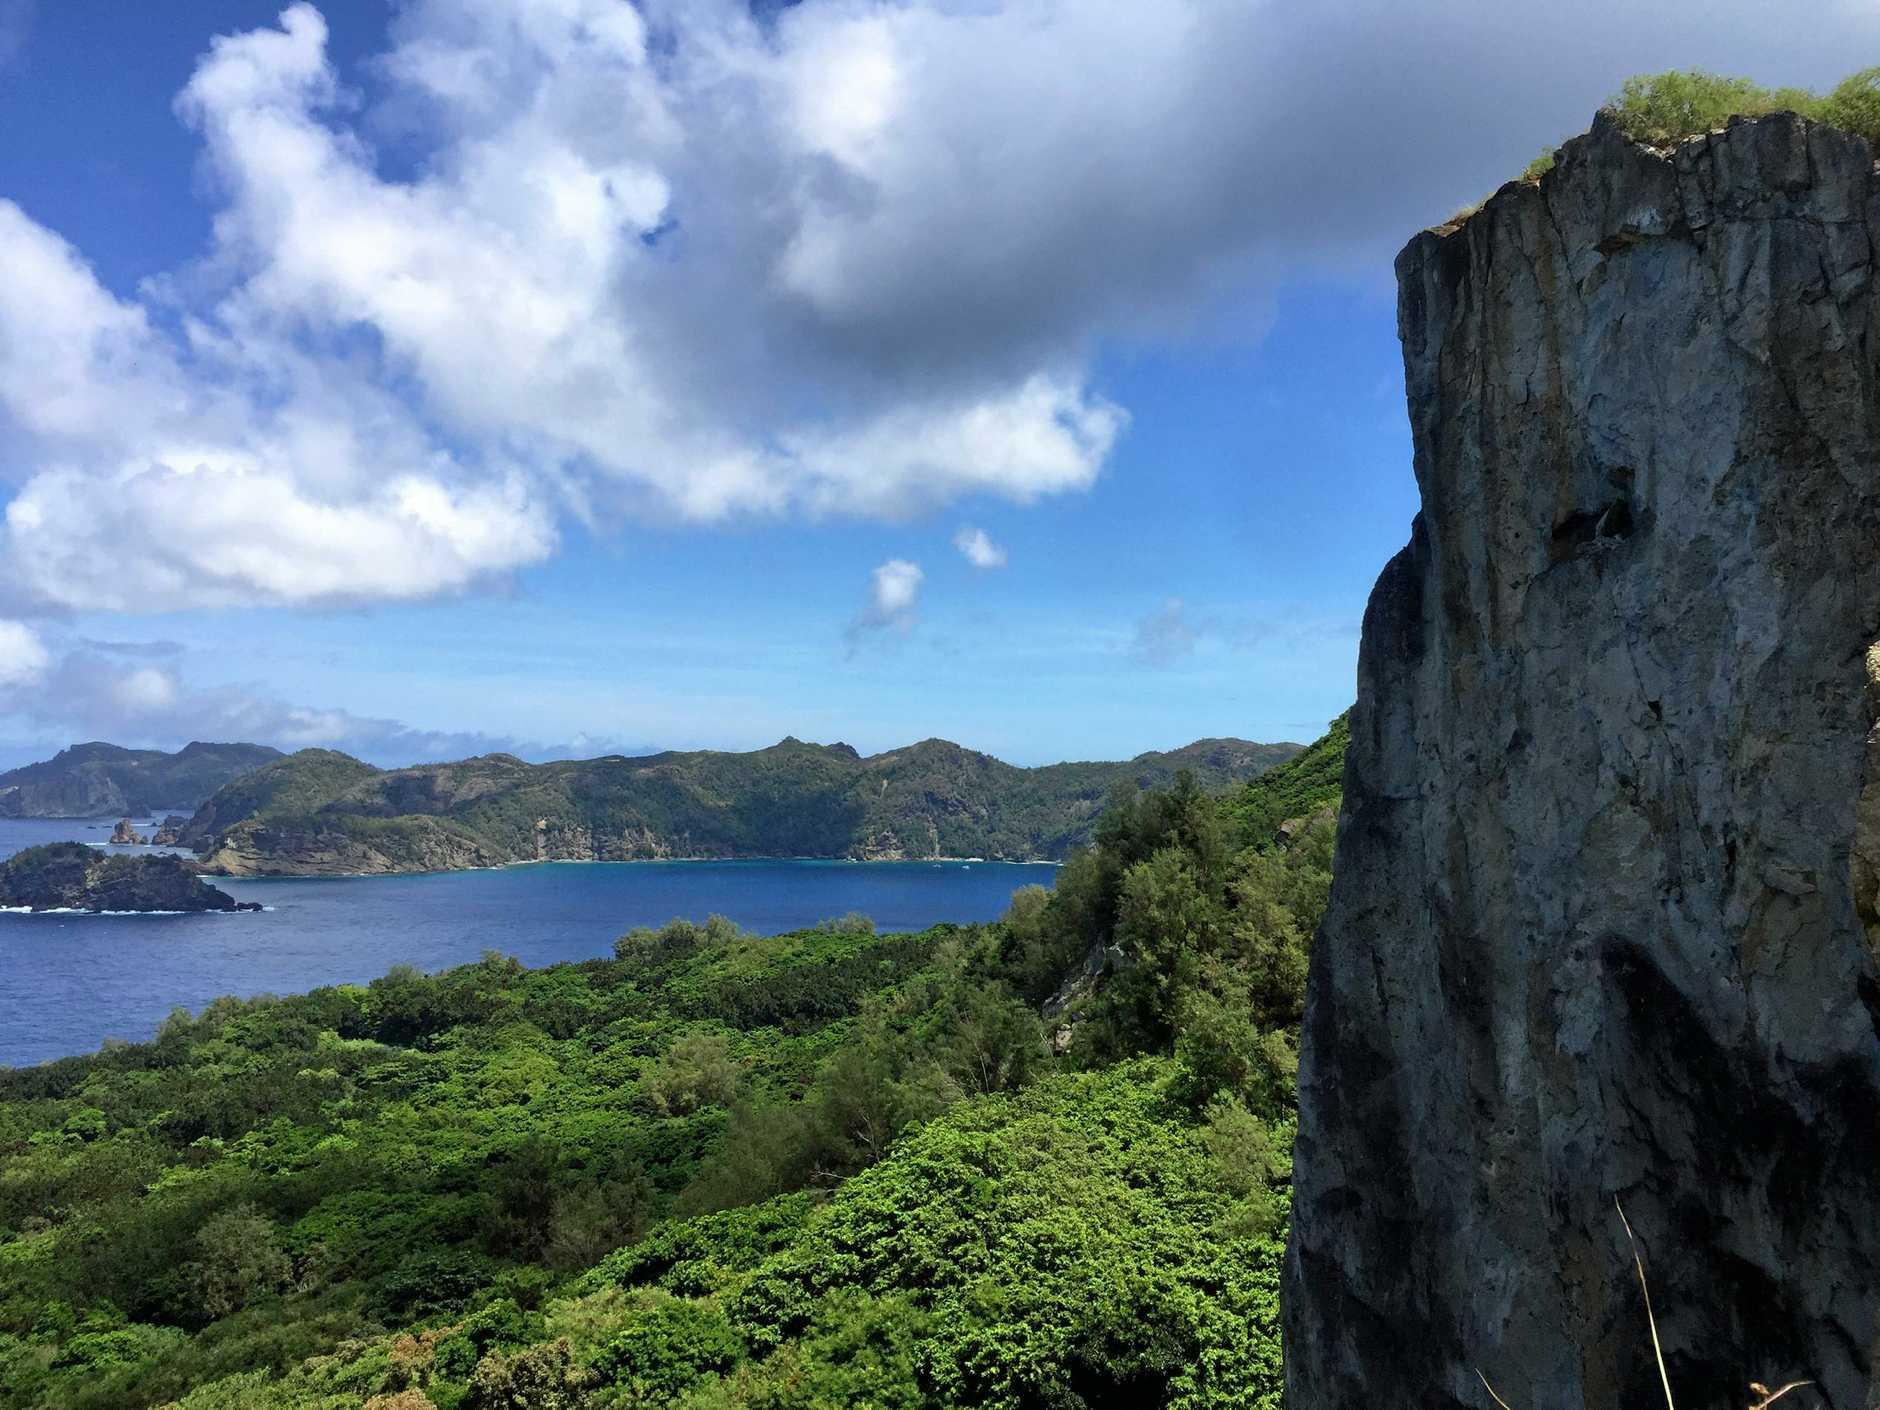 Beautiful lush bay anchorage on the East coast of Chichi Jima.